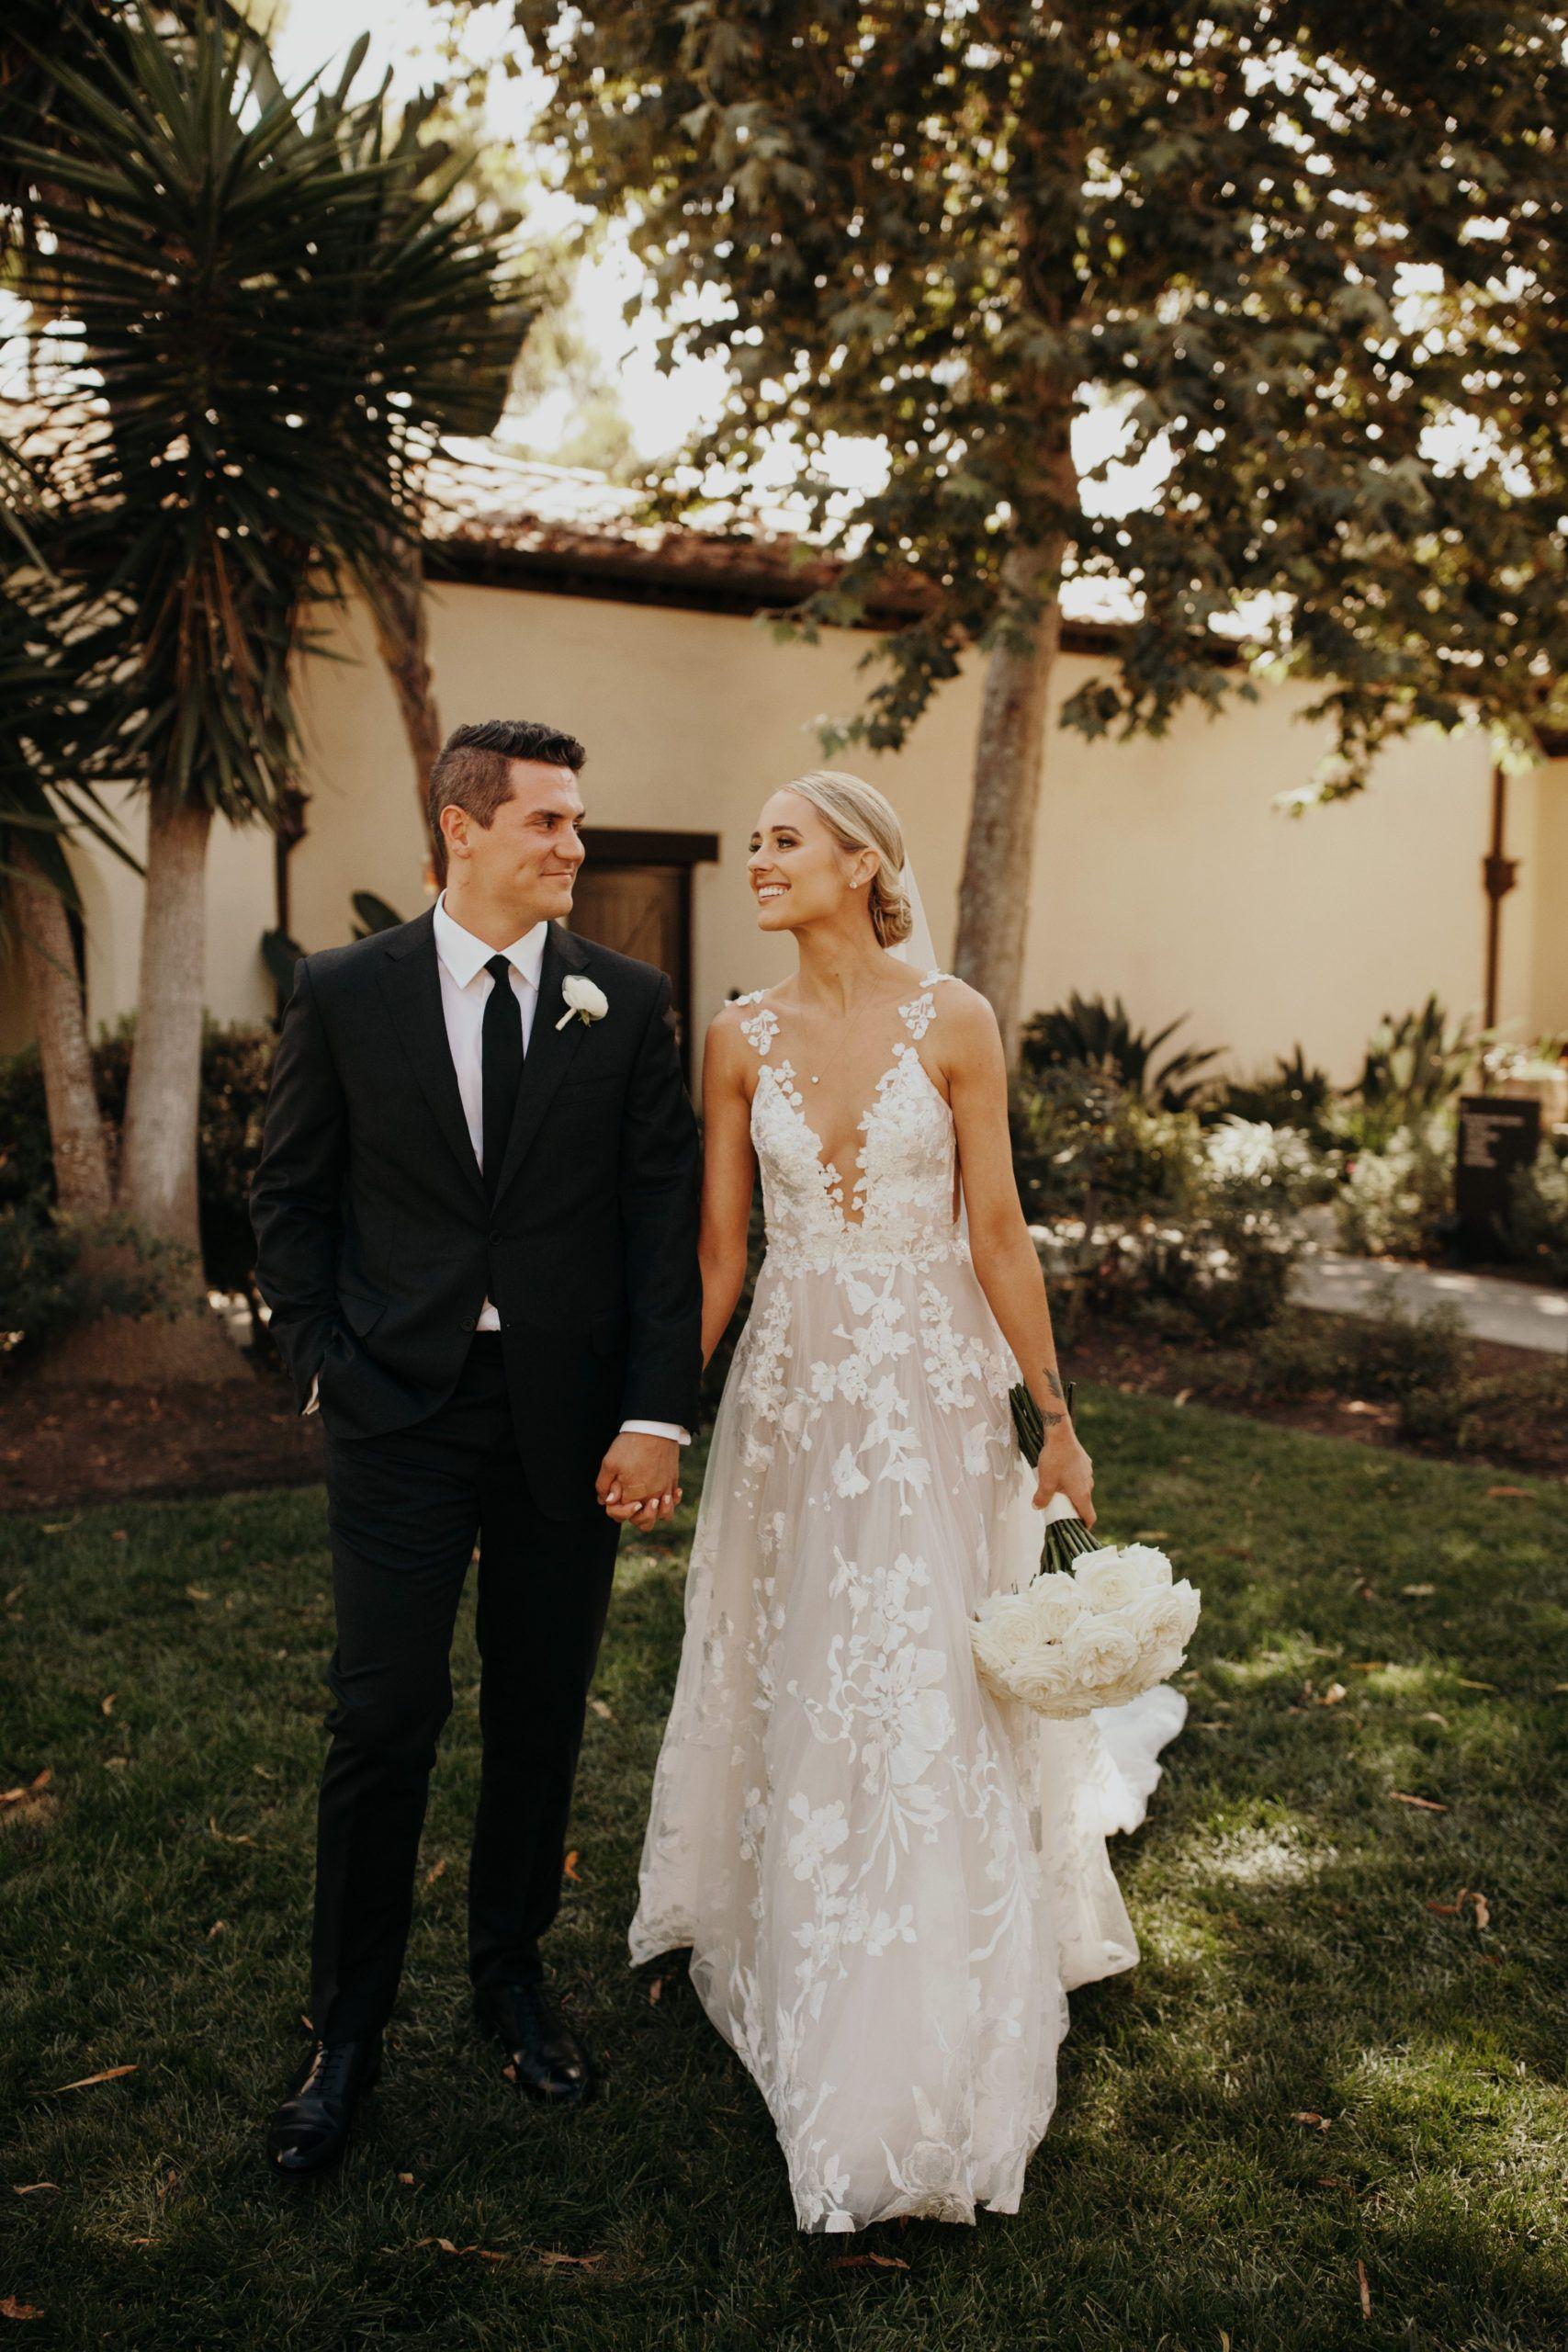 Outdoor Wedding California Wedding Southern California Wedding Wedding Dress Summer Wedding Wedding Rehearsal Outfit Summer Wedding Dress Blonde Bride [ 2560 x 1707 Pixel ]